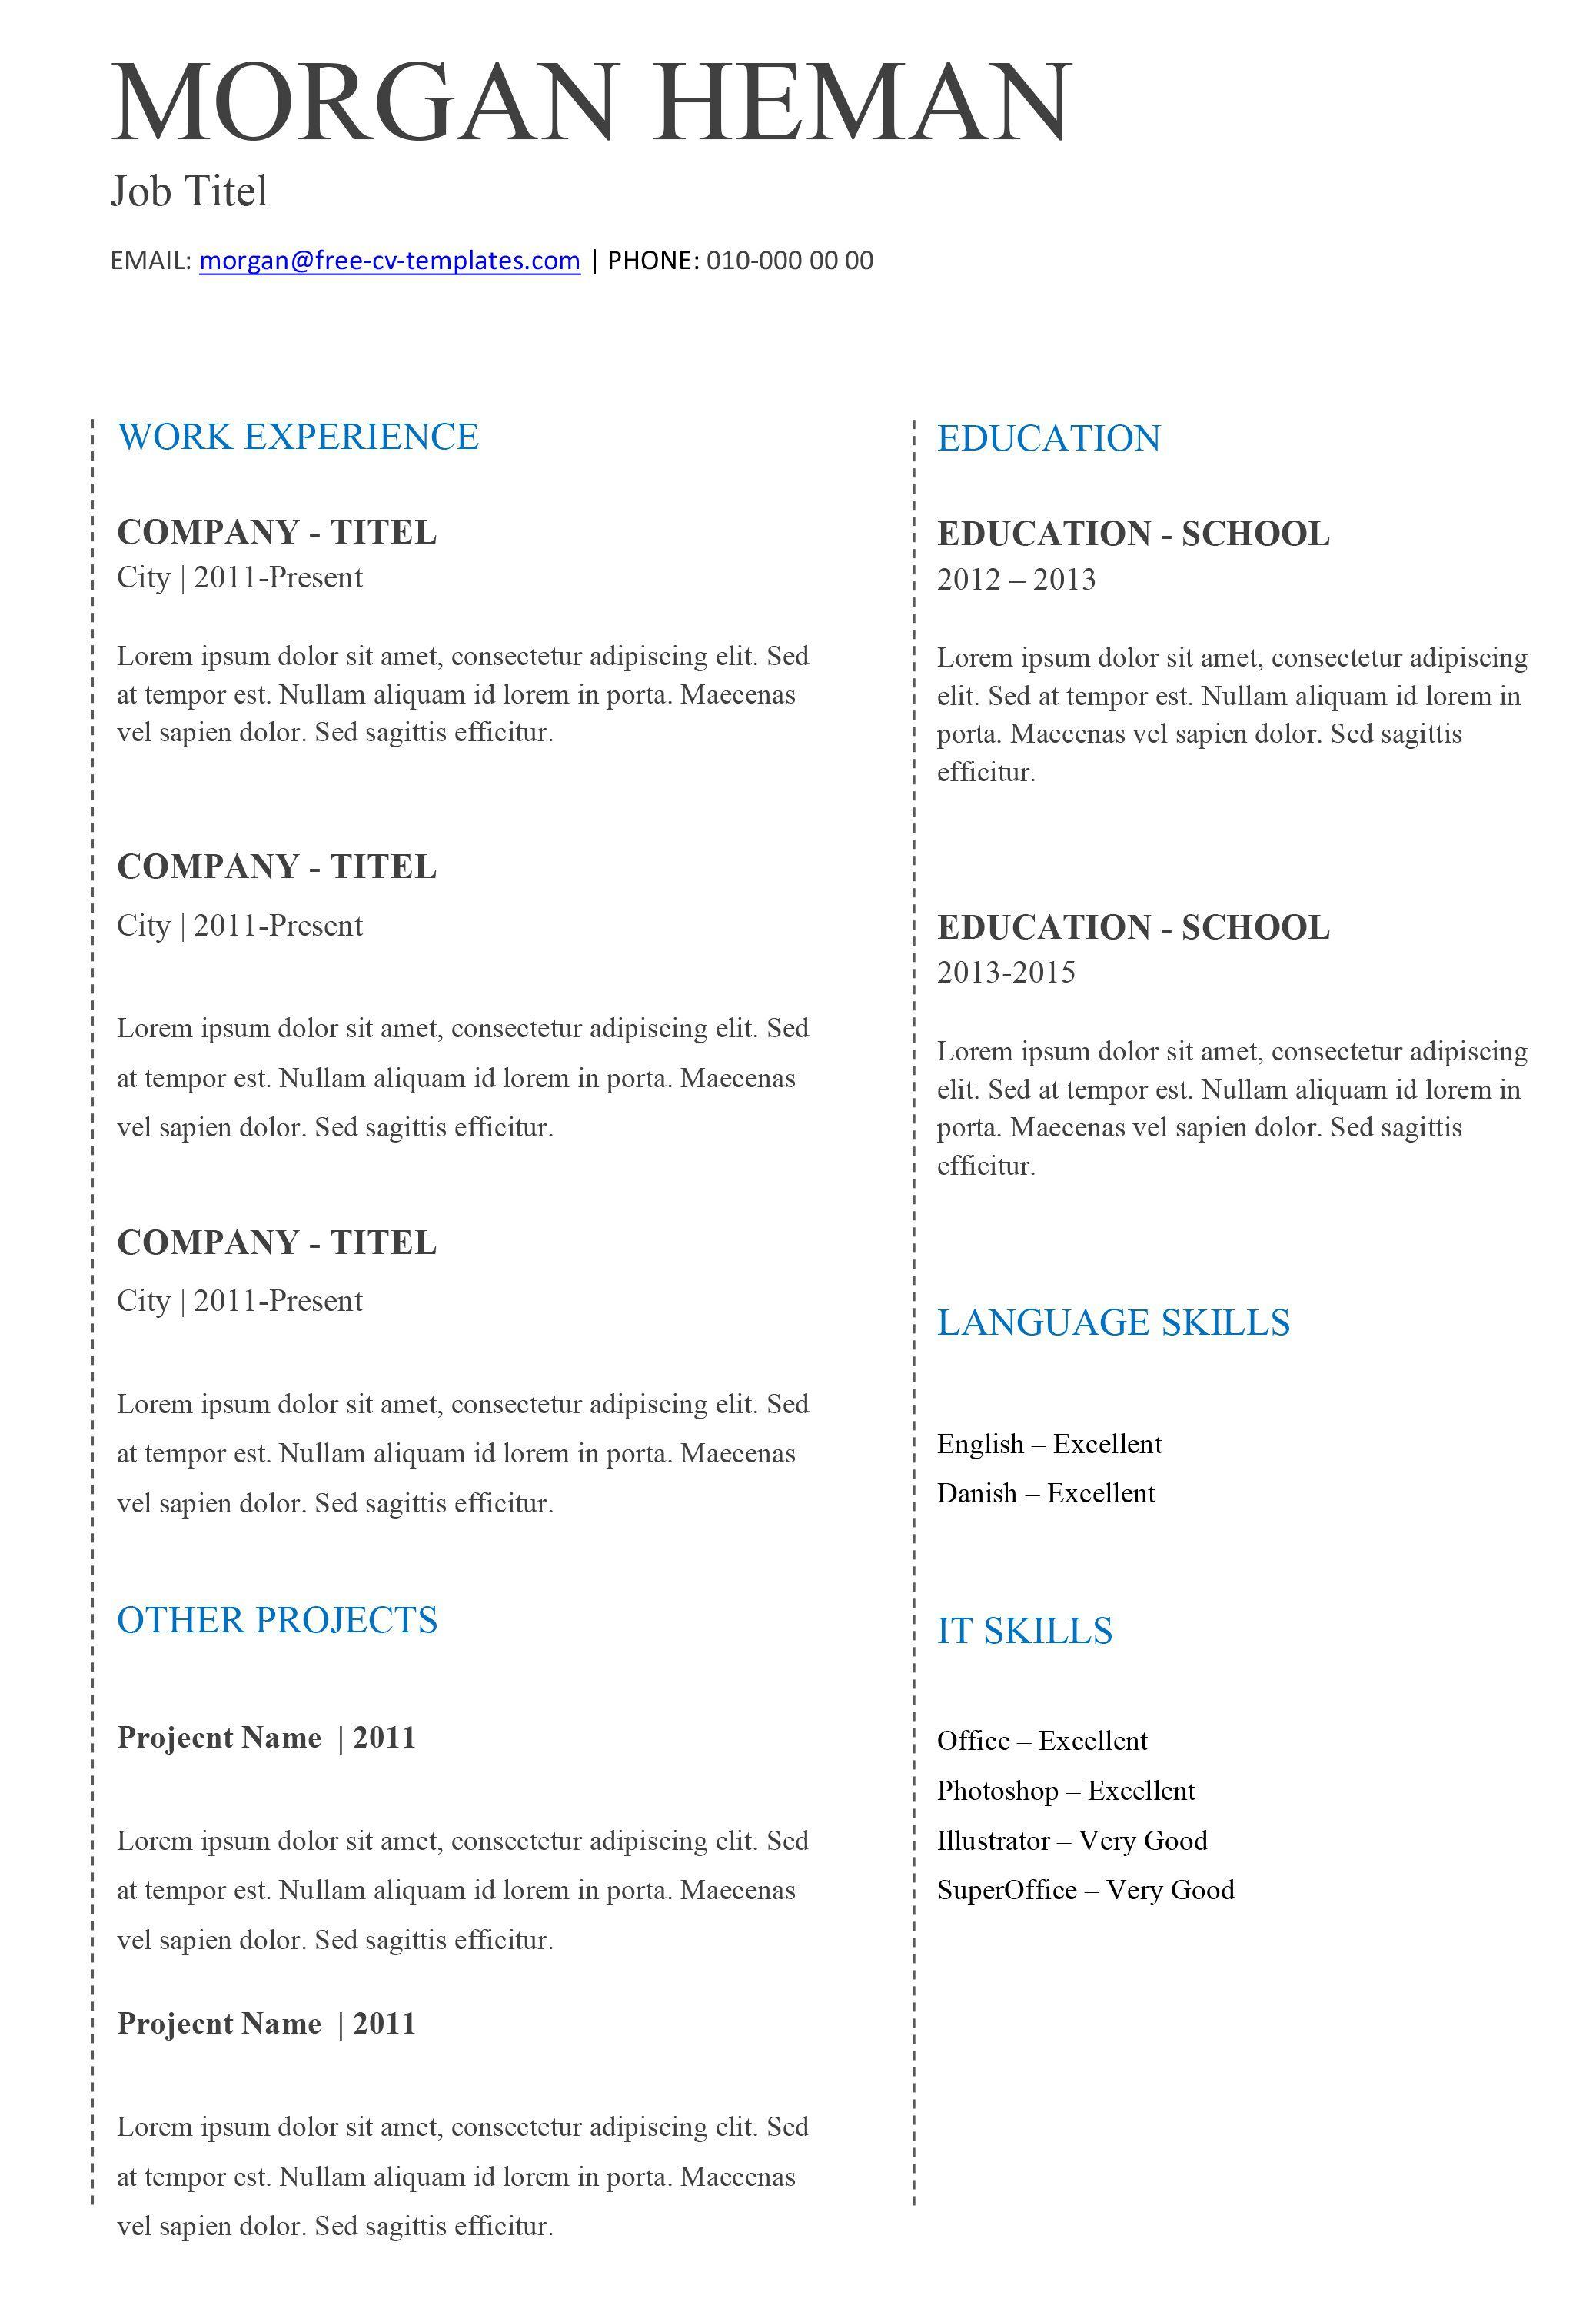 005 Formidable Easy Resume Template Free Image  Simple Download Online WordFull